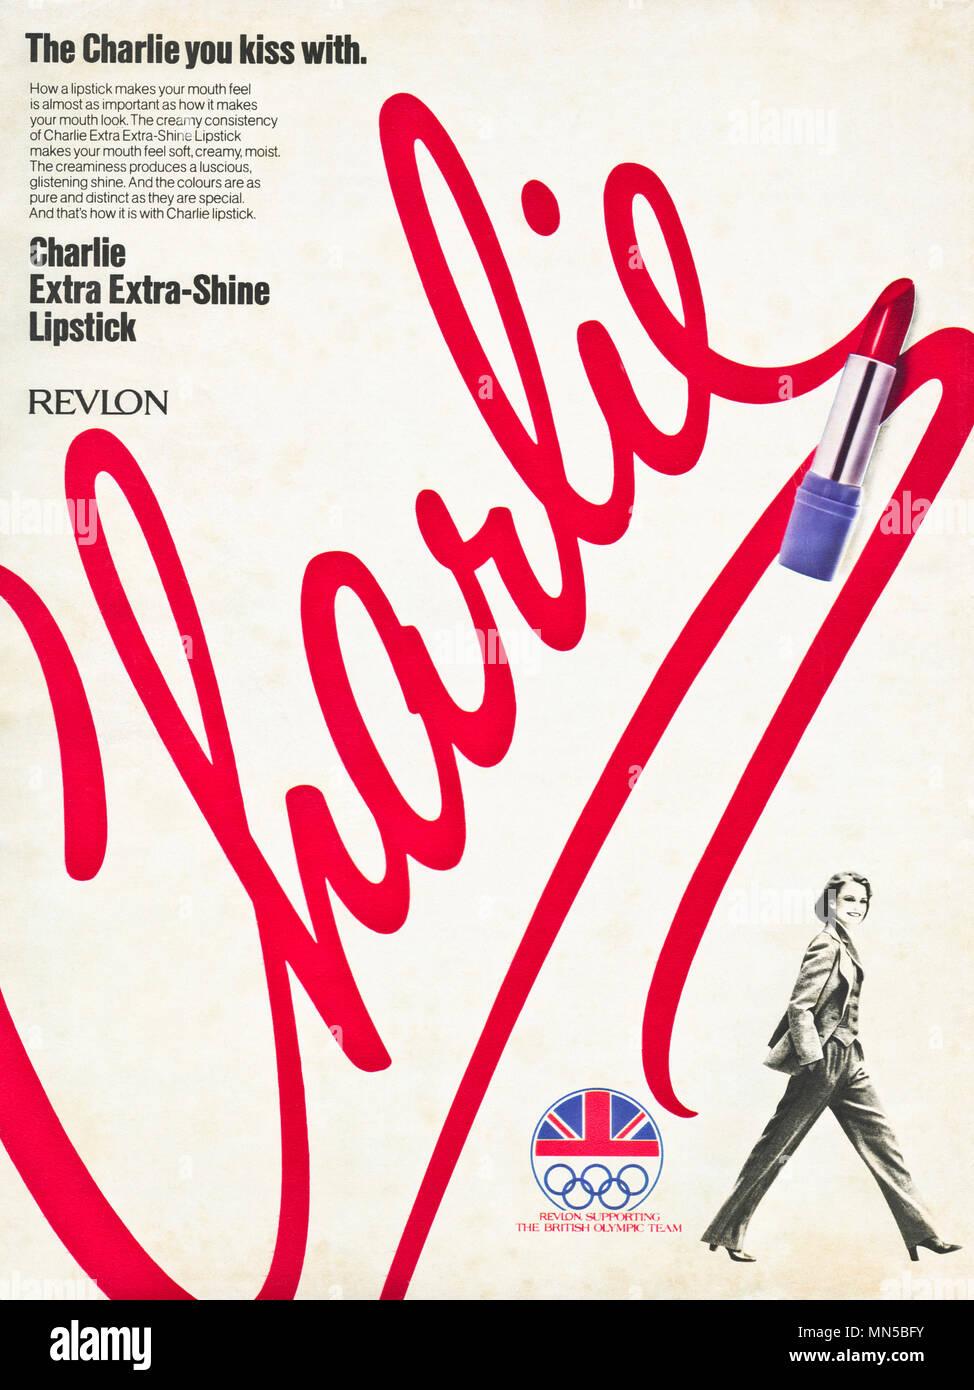 1980s original old vintage advertisement advertising Charlie lipstick by Revlon in English magazine circa 1980 - Stock Image